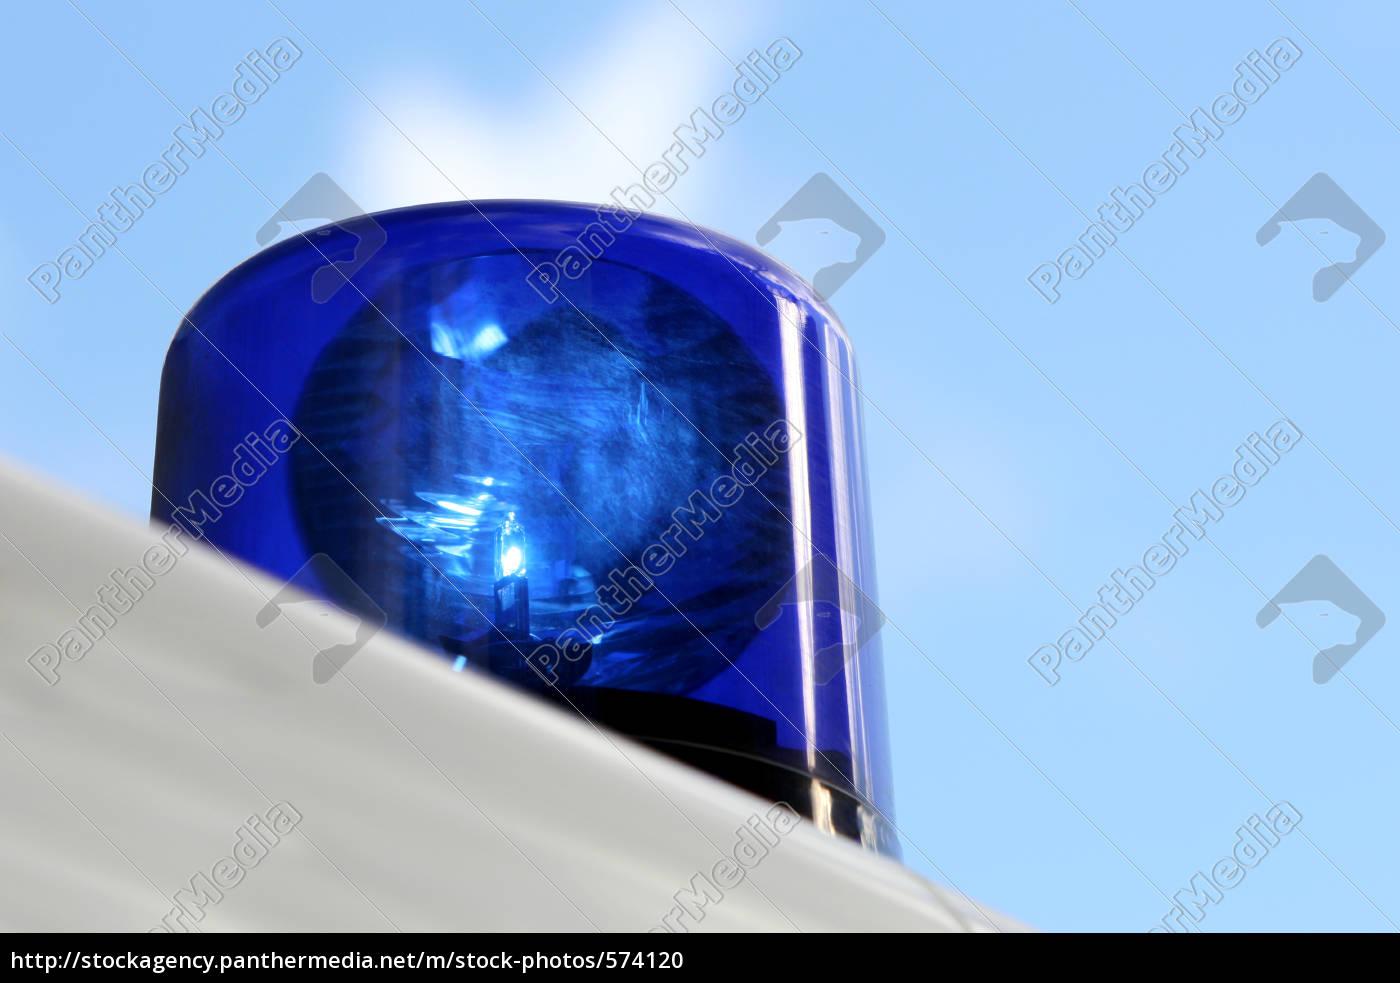 blue, light, 2 - 574120